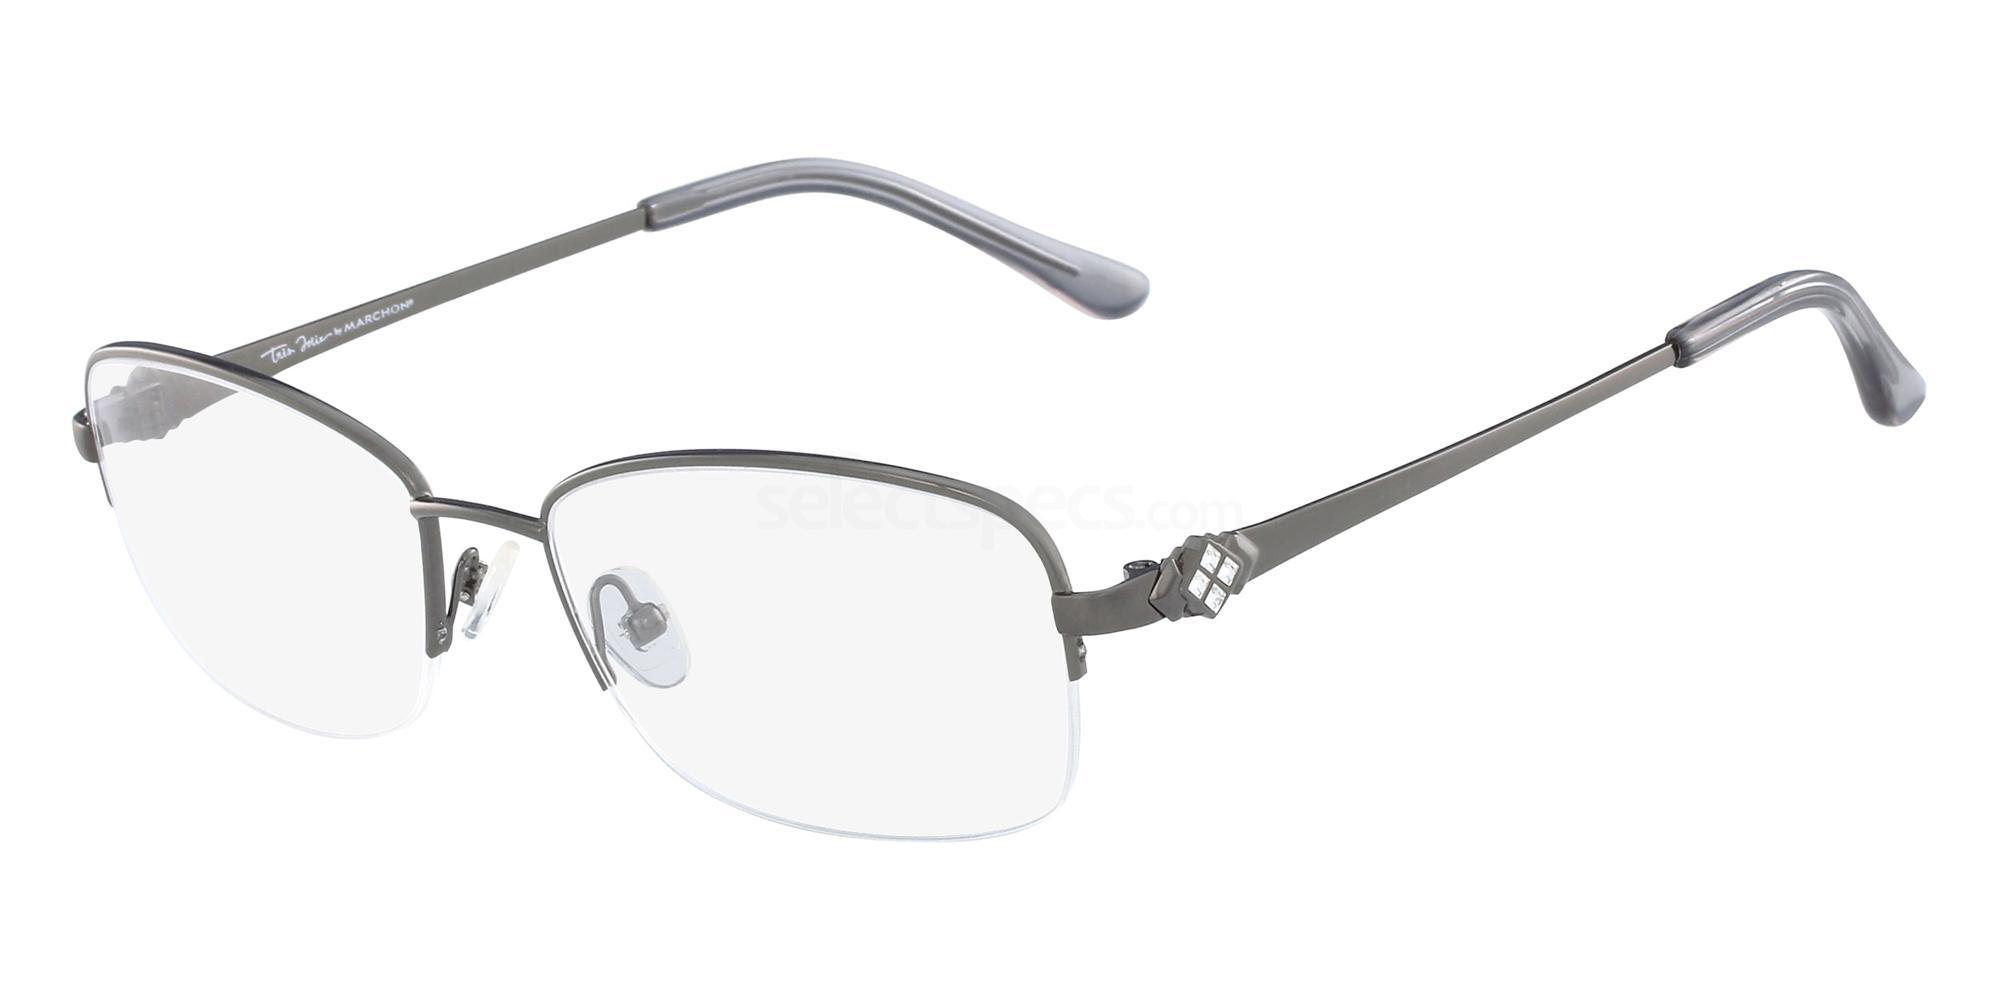 033 TRES JOLIE 173 Glasses, Tres Jolie